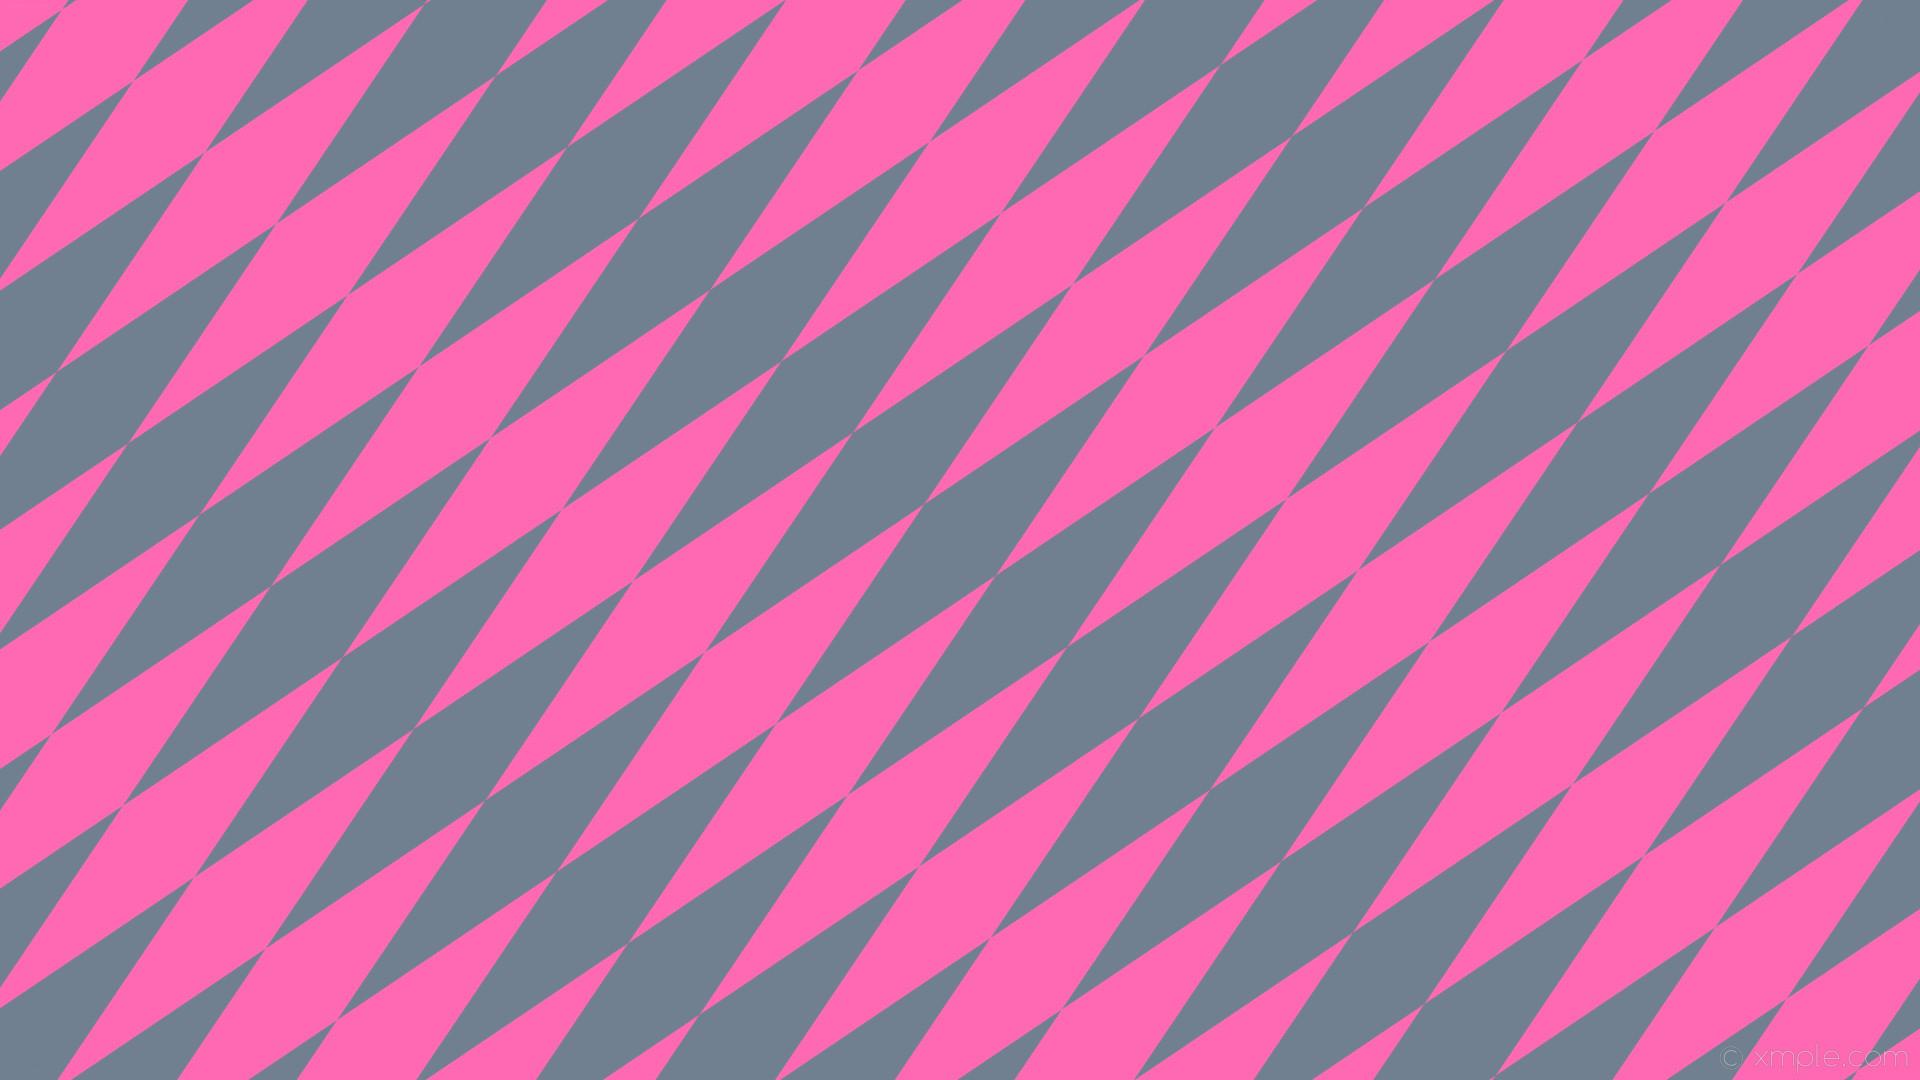 Res: 1920x1080, wallpaper rhombus lozenge pink diamond grey slate gray hot pink #708090  #ff69b4 45°